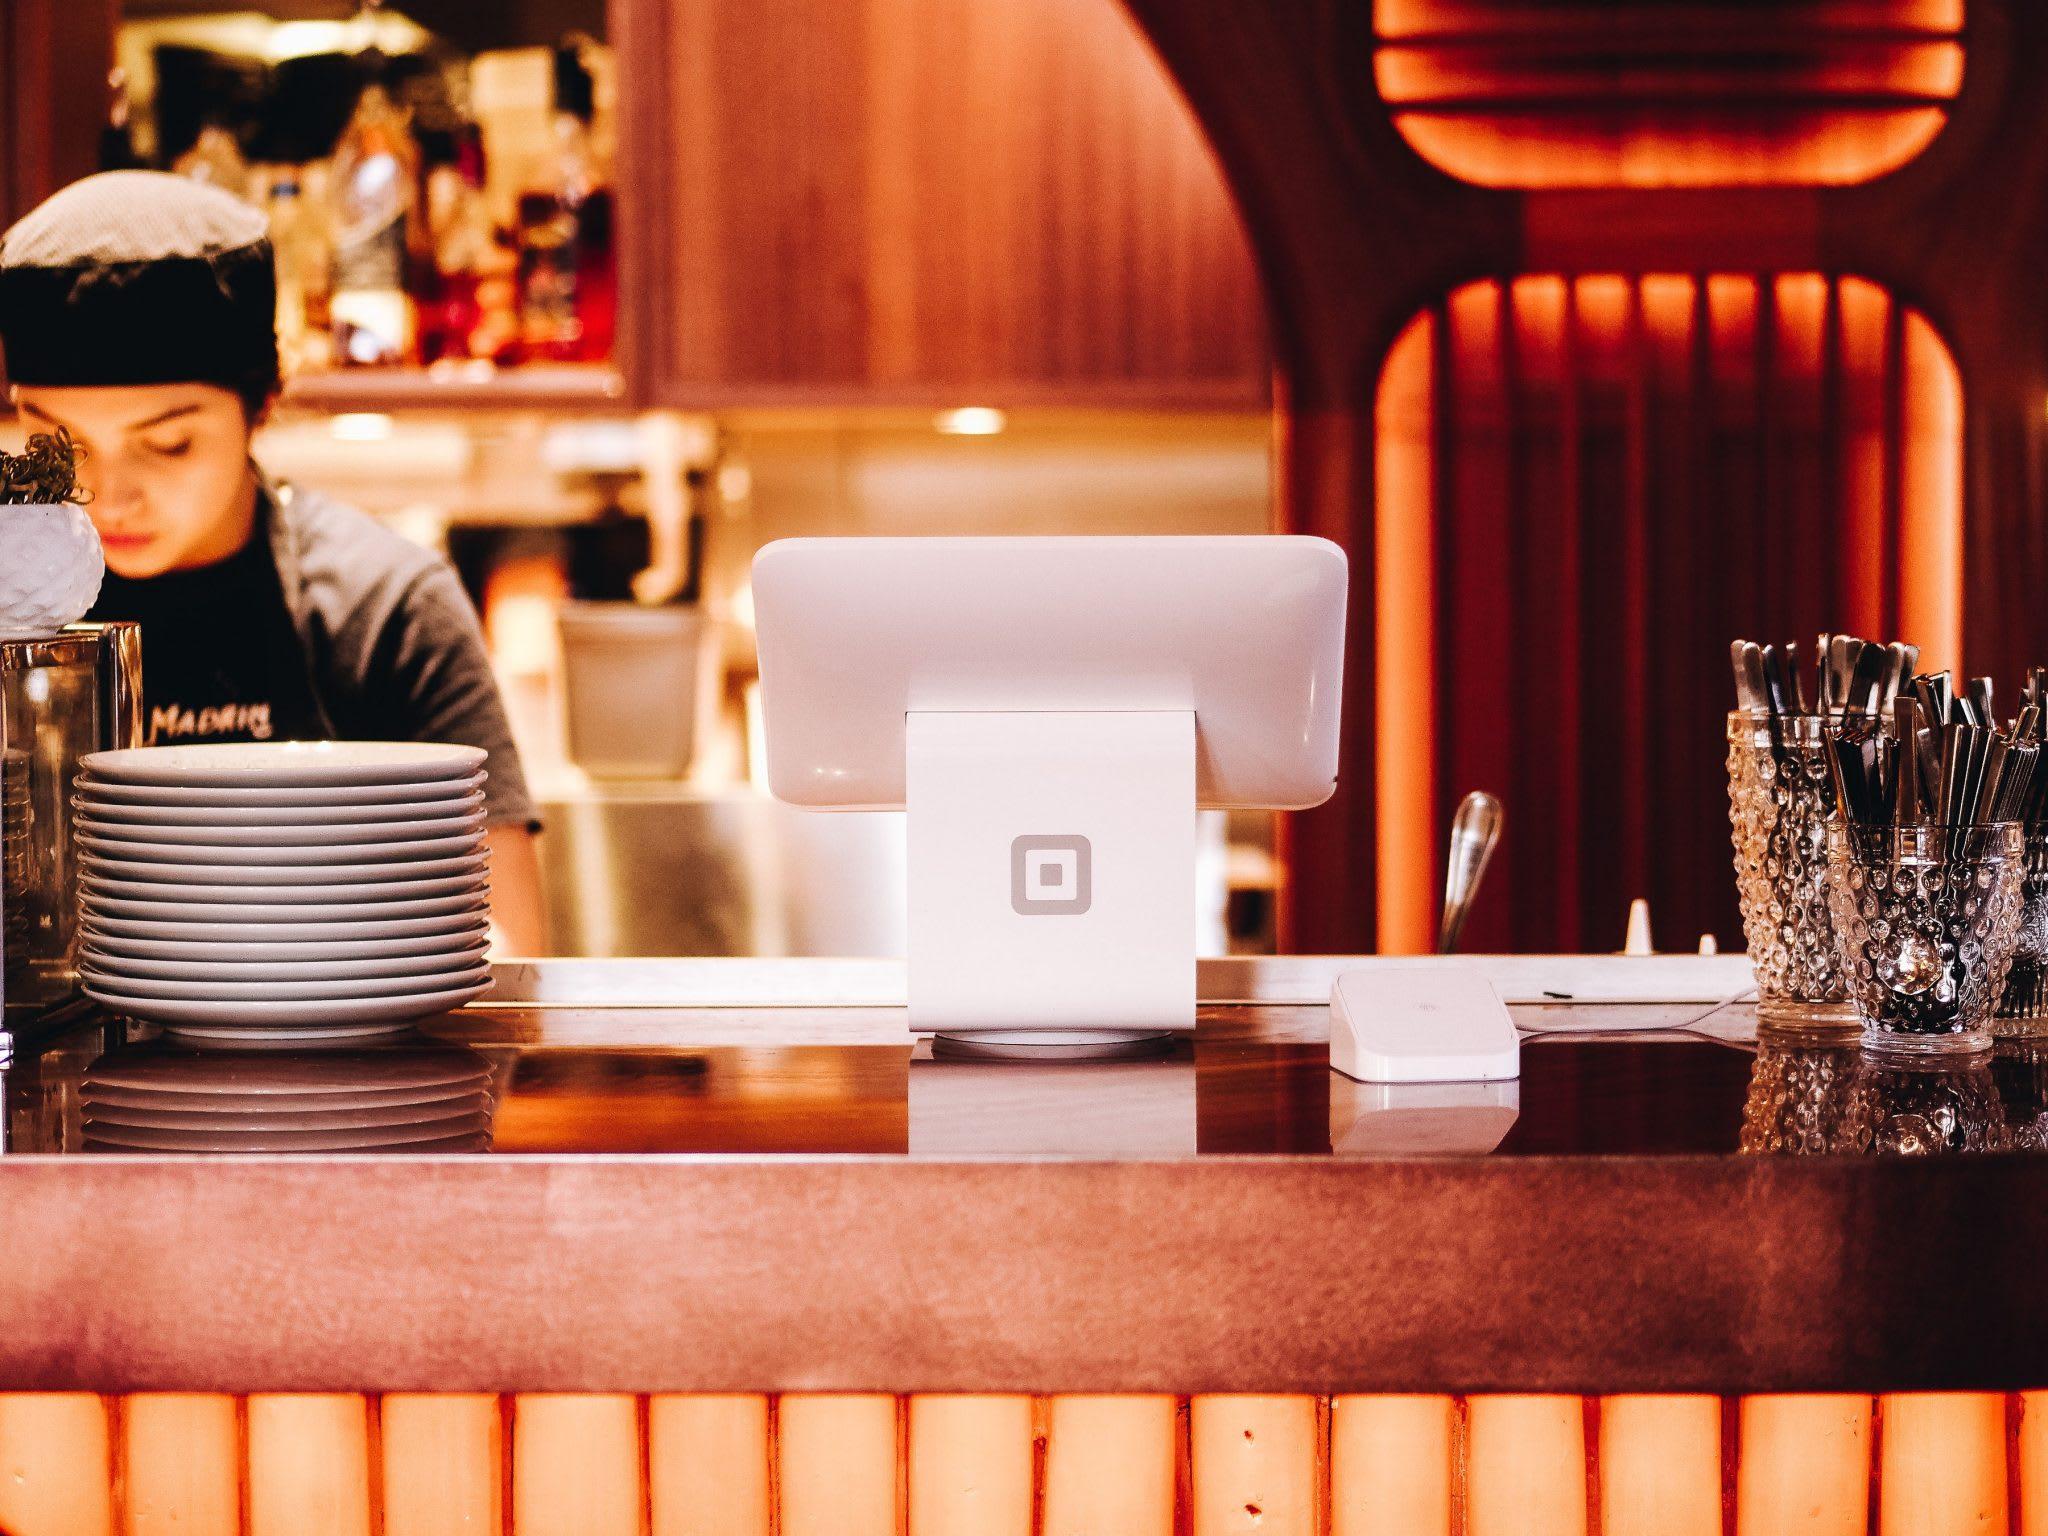 restaurant, table, ipad, plates, woman, restaurant maangement tools